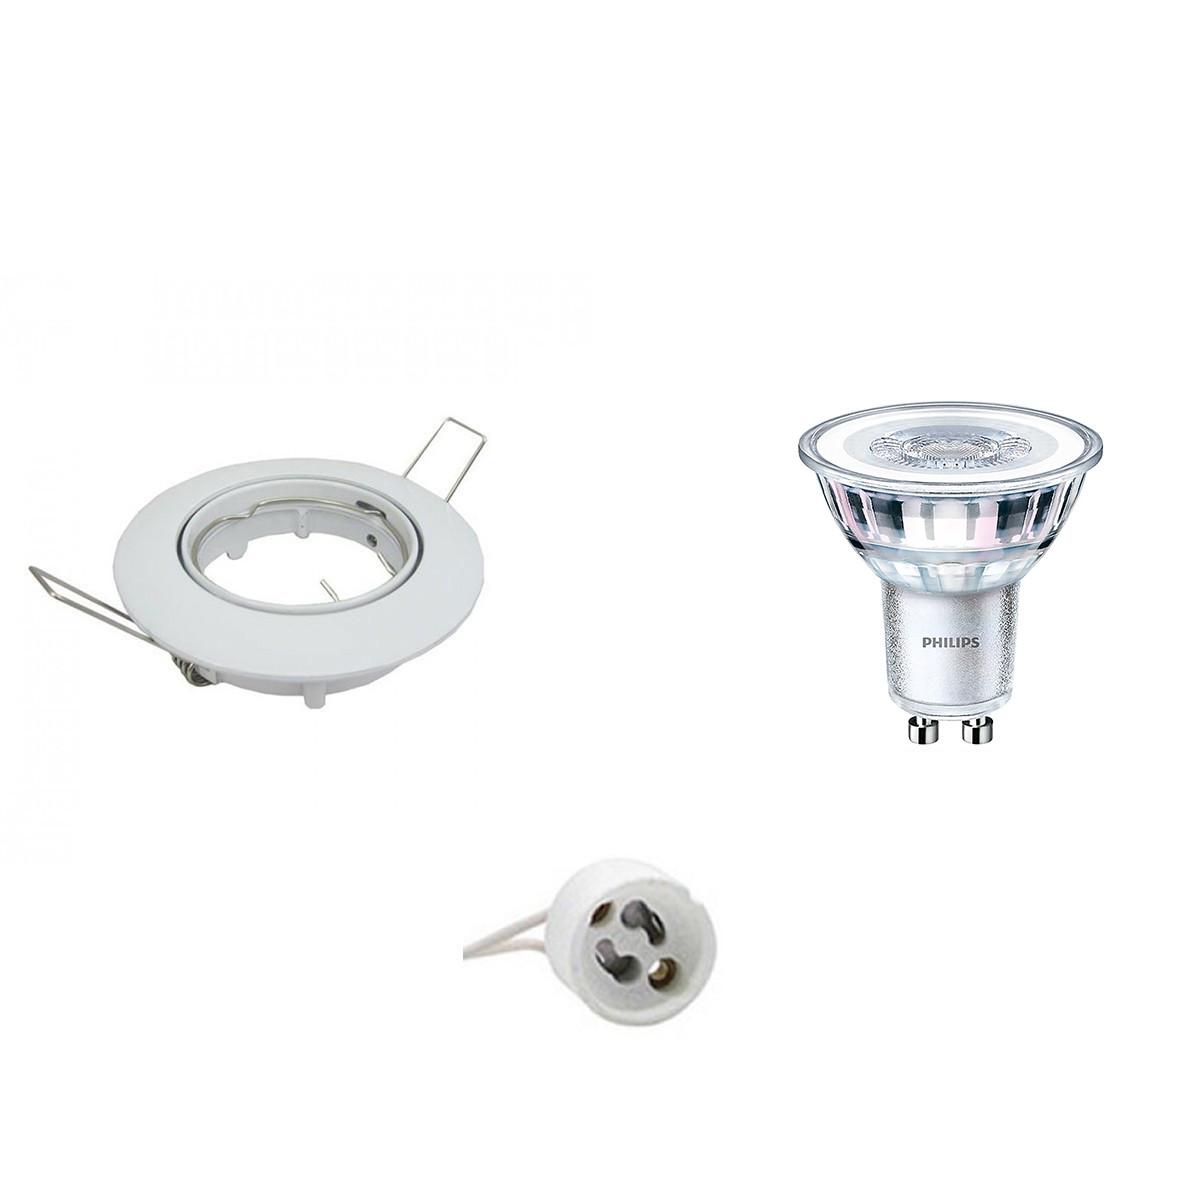 PHILIPS - LED Spot Set - CorePro 830 36D - GU10 Fitting - Dimbaar - Inbouw Rond - Glans Wit - 4W - W